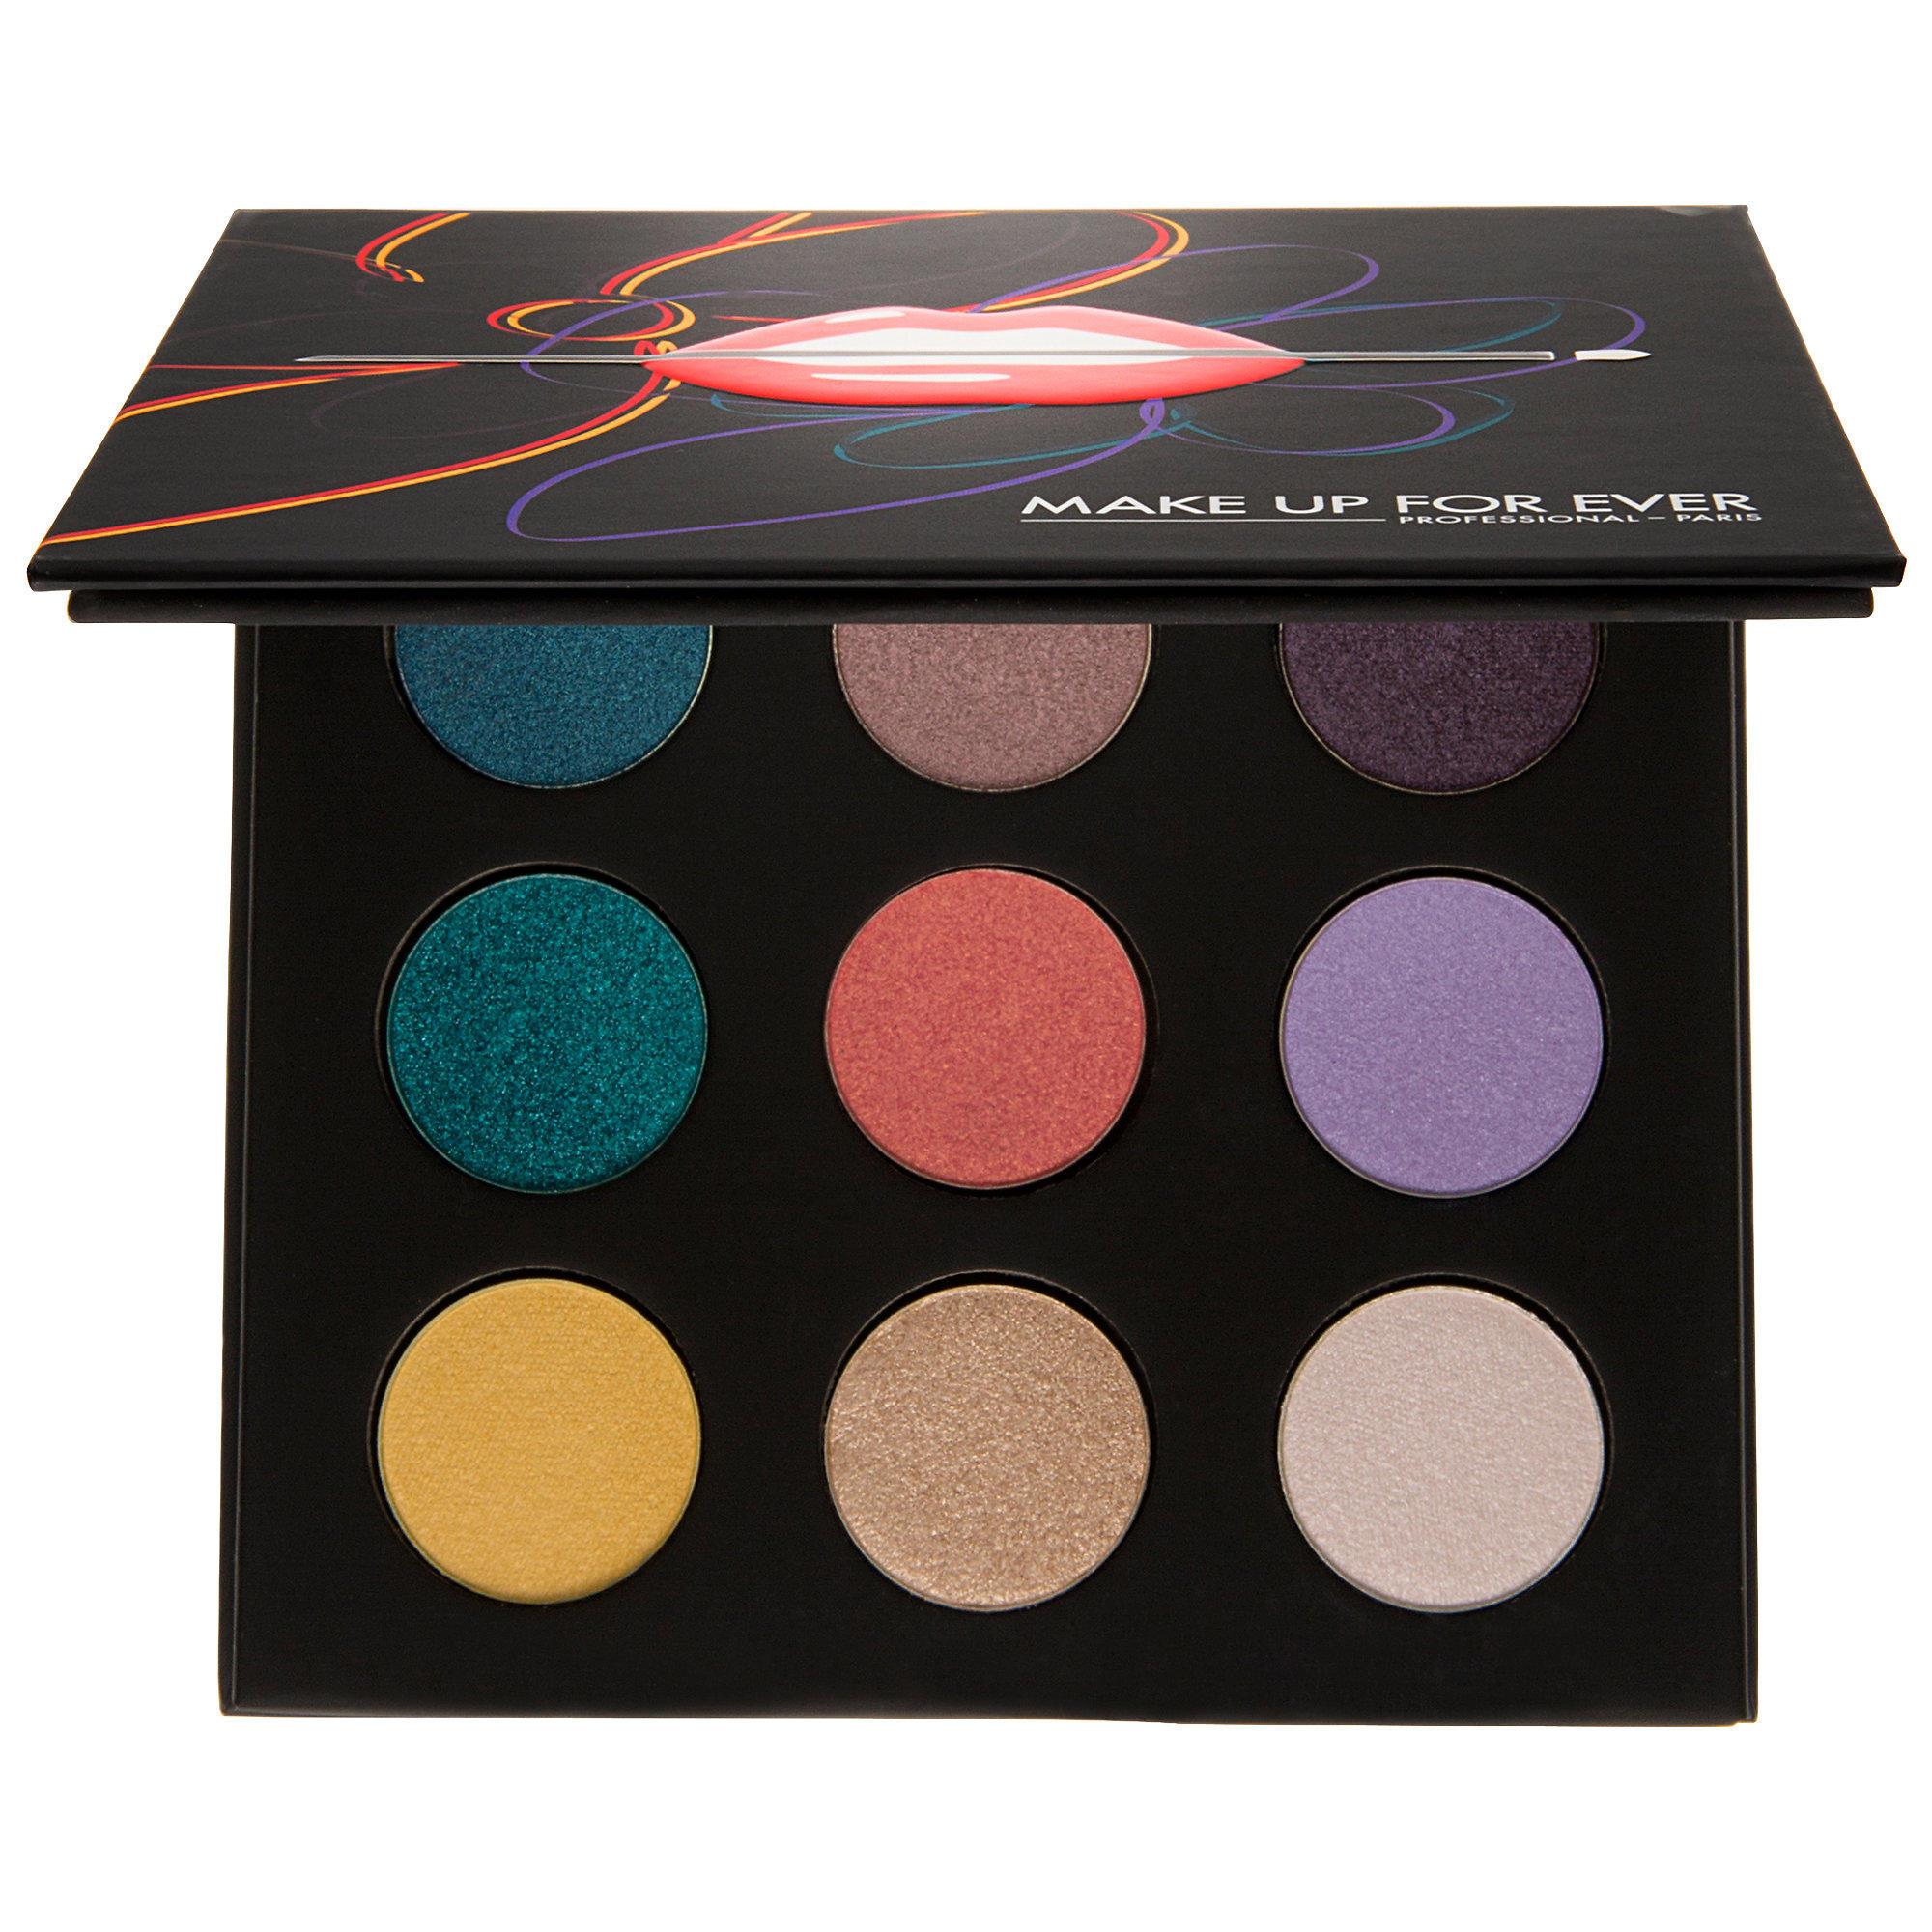 Makeup Forever 9 Artist Shadow Palette Florals Volume 3